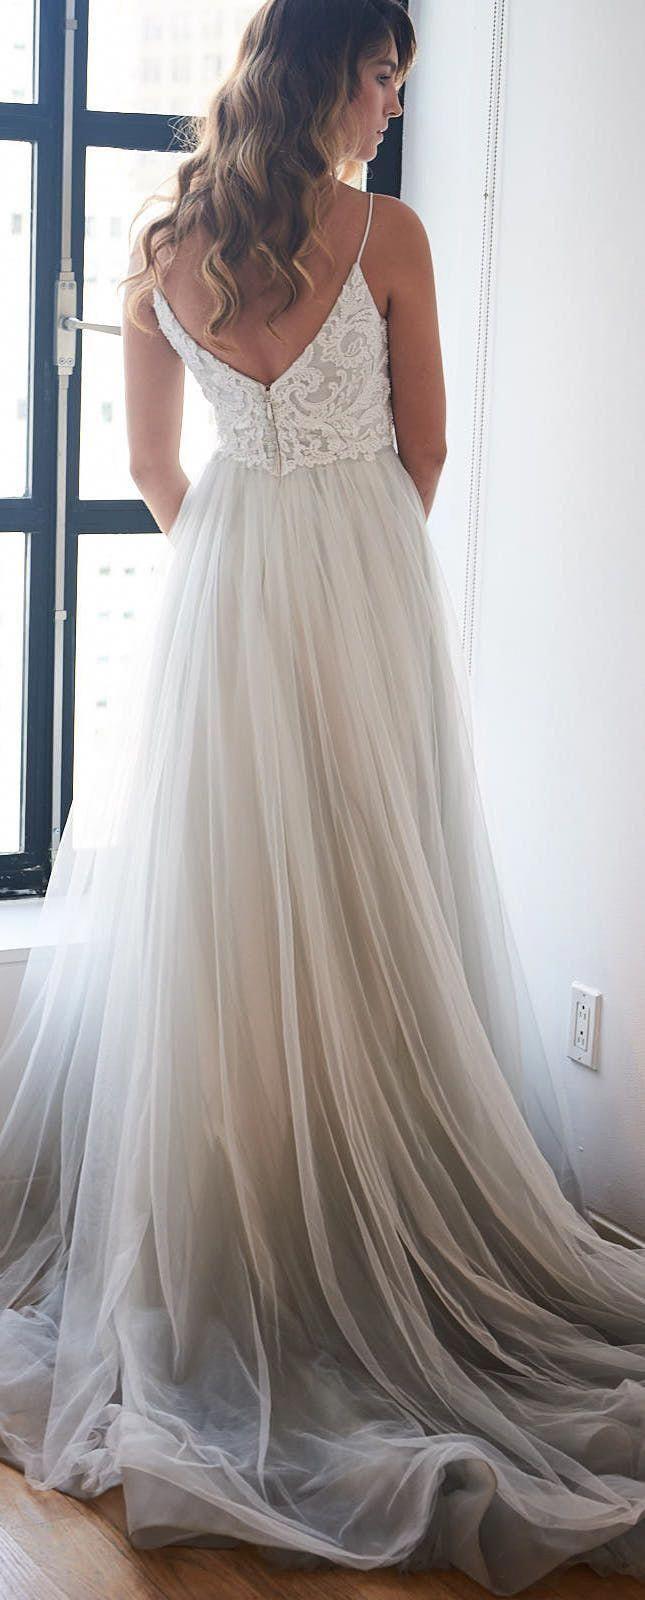 Star wedding dress by kelly faetanini in blue pearlescent